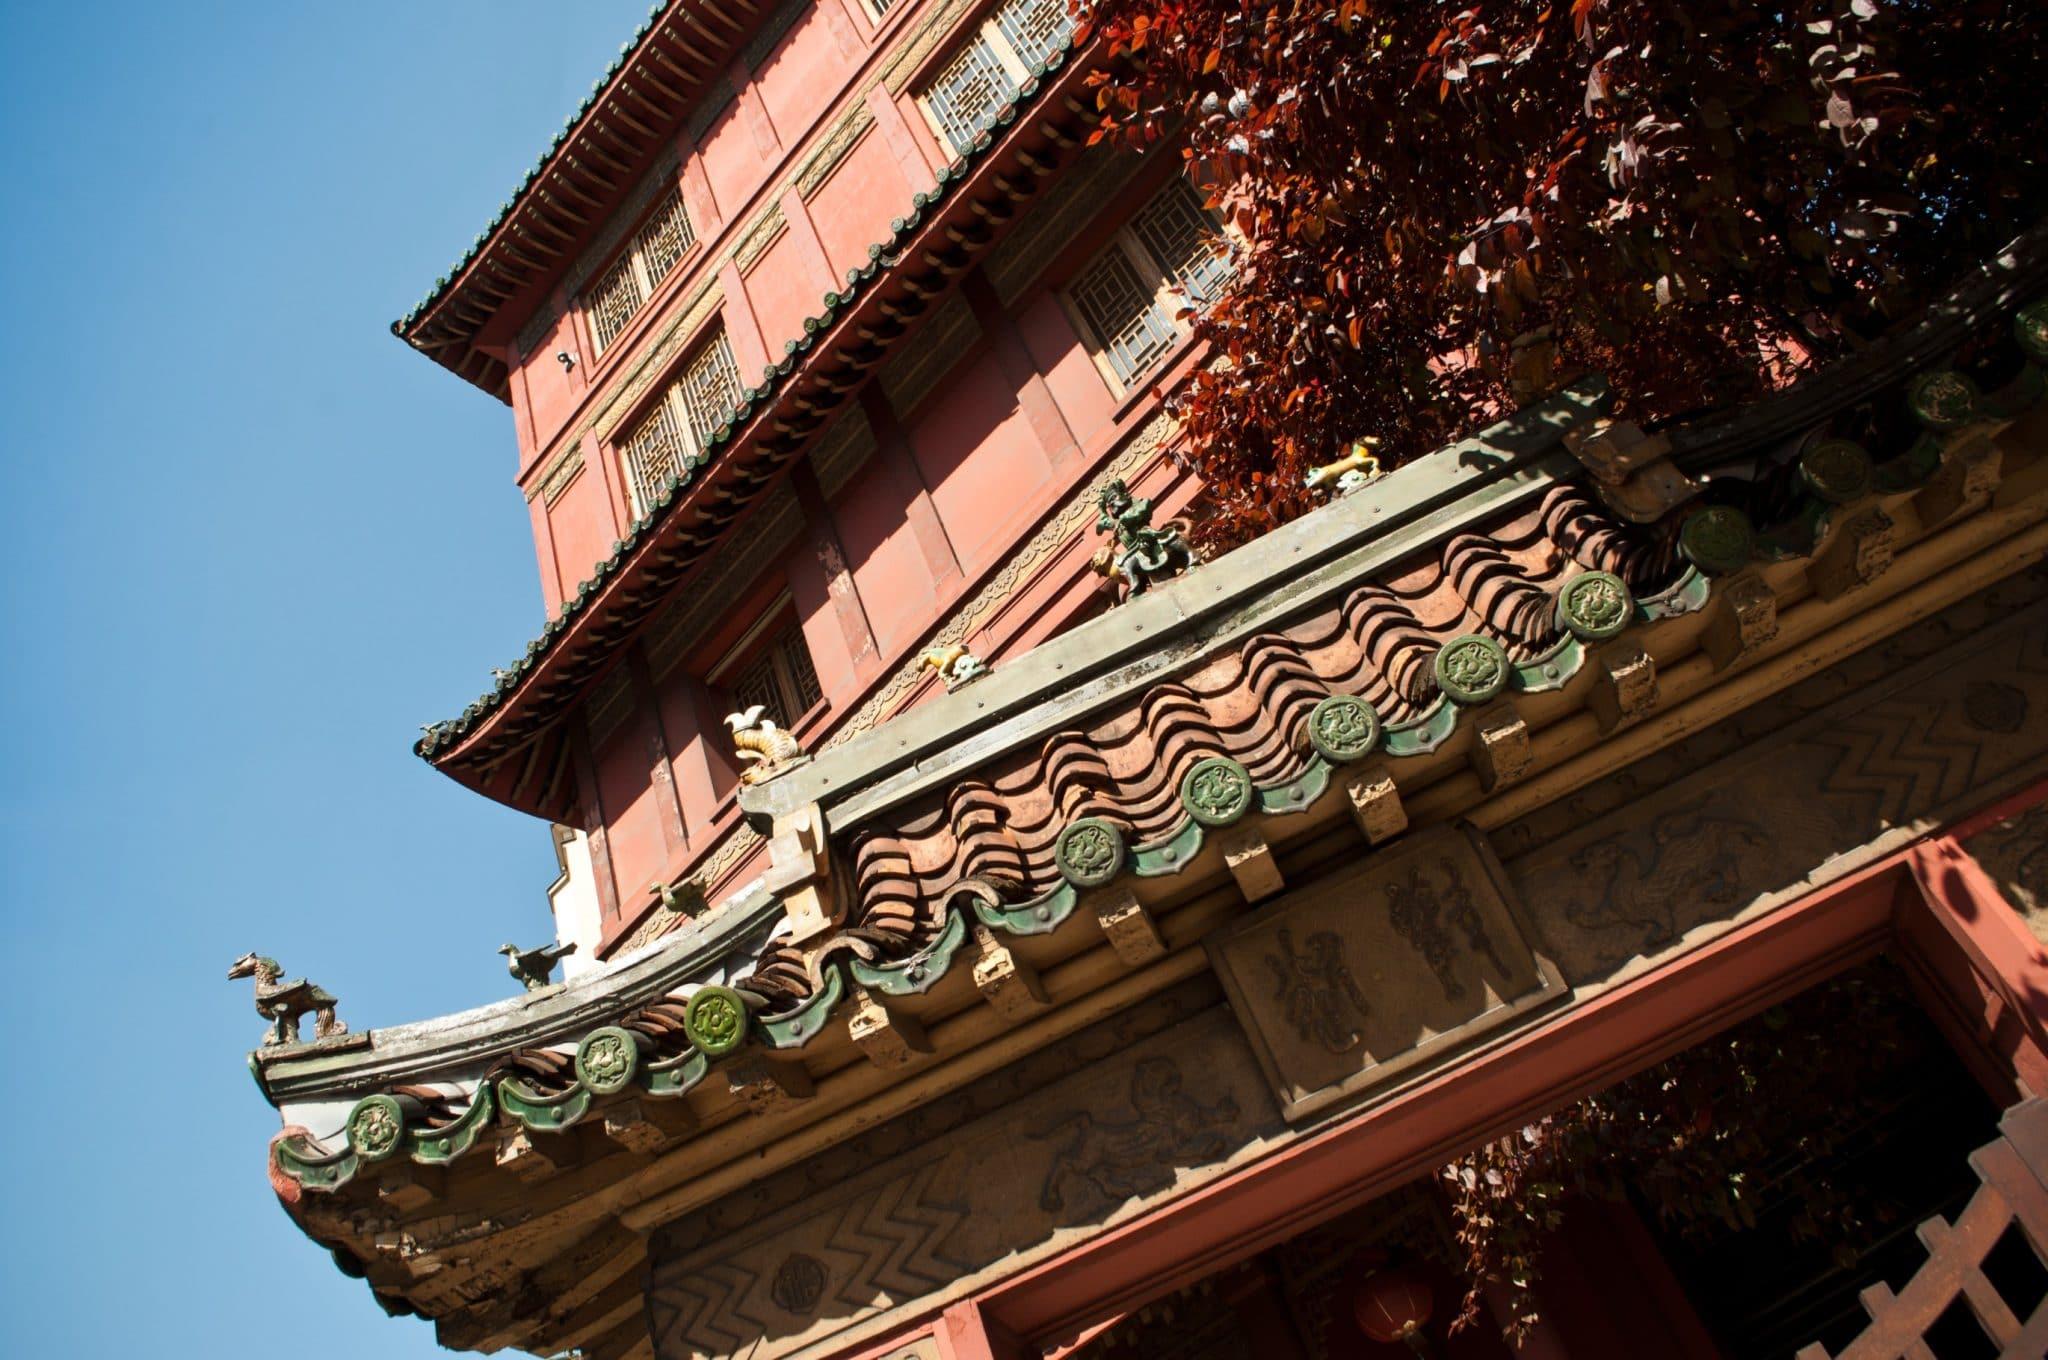 pagode chinoise paris rouge toit portail porte pagoda maison loo histoire